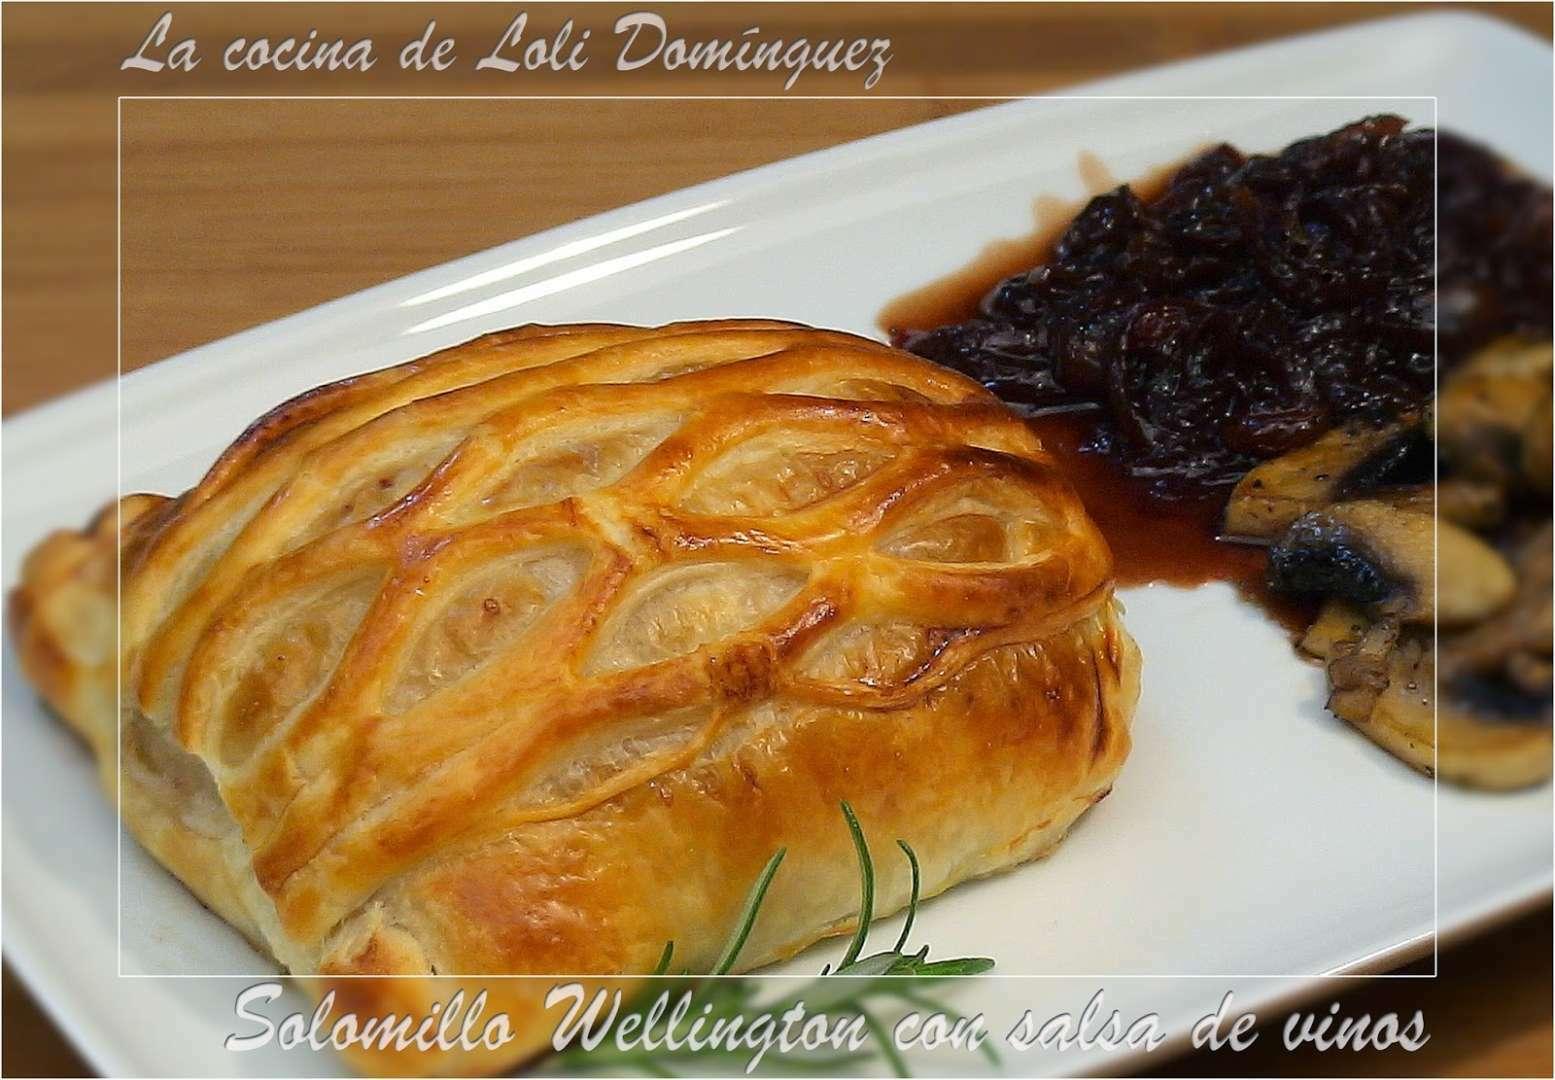 Solomillo wellington con salsa de vinos receta petitchef - Salsa de oporto para solomillo ...